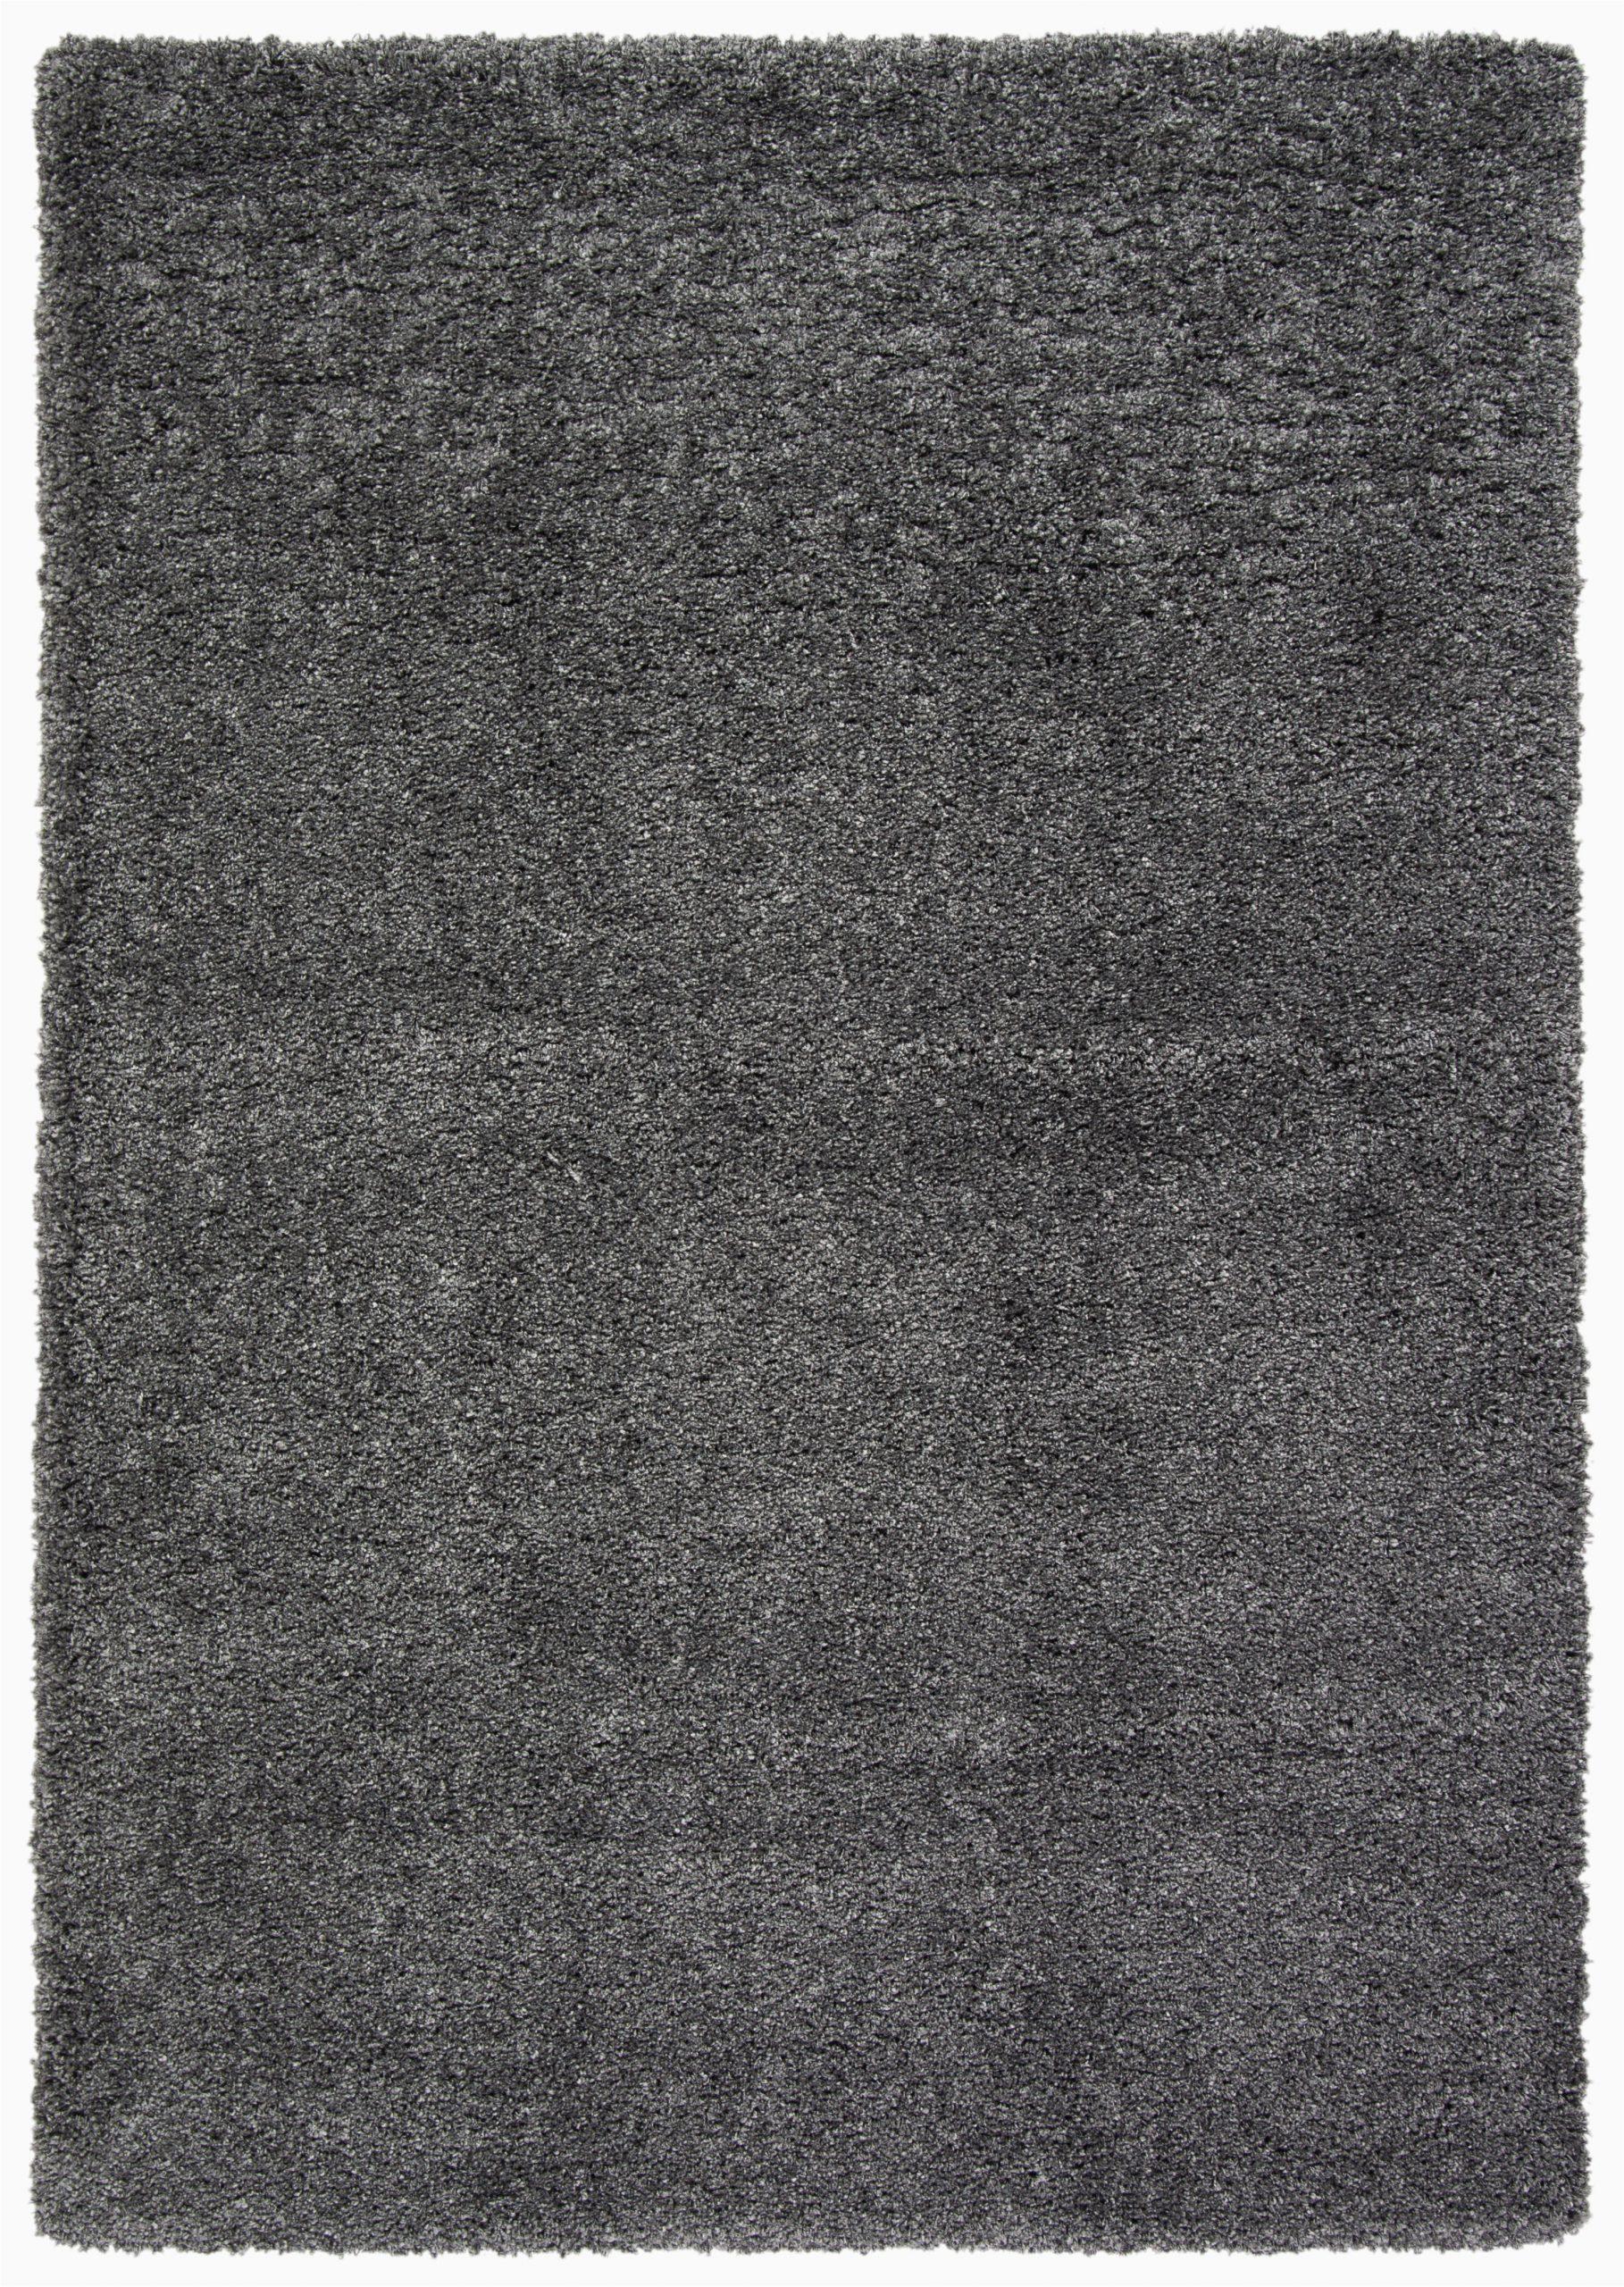 eunice dark gray area rug